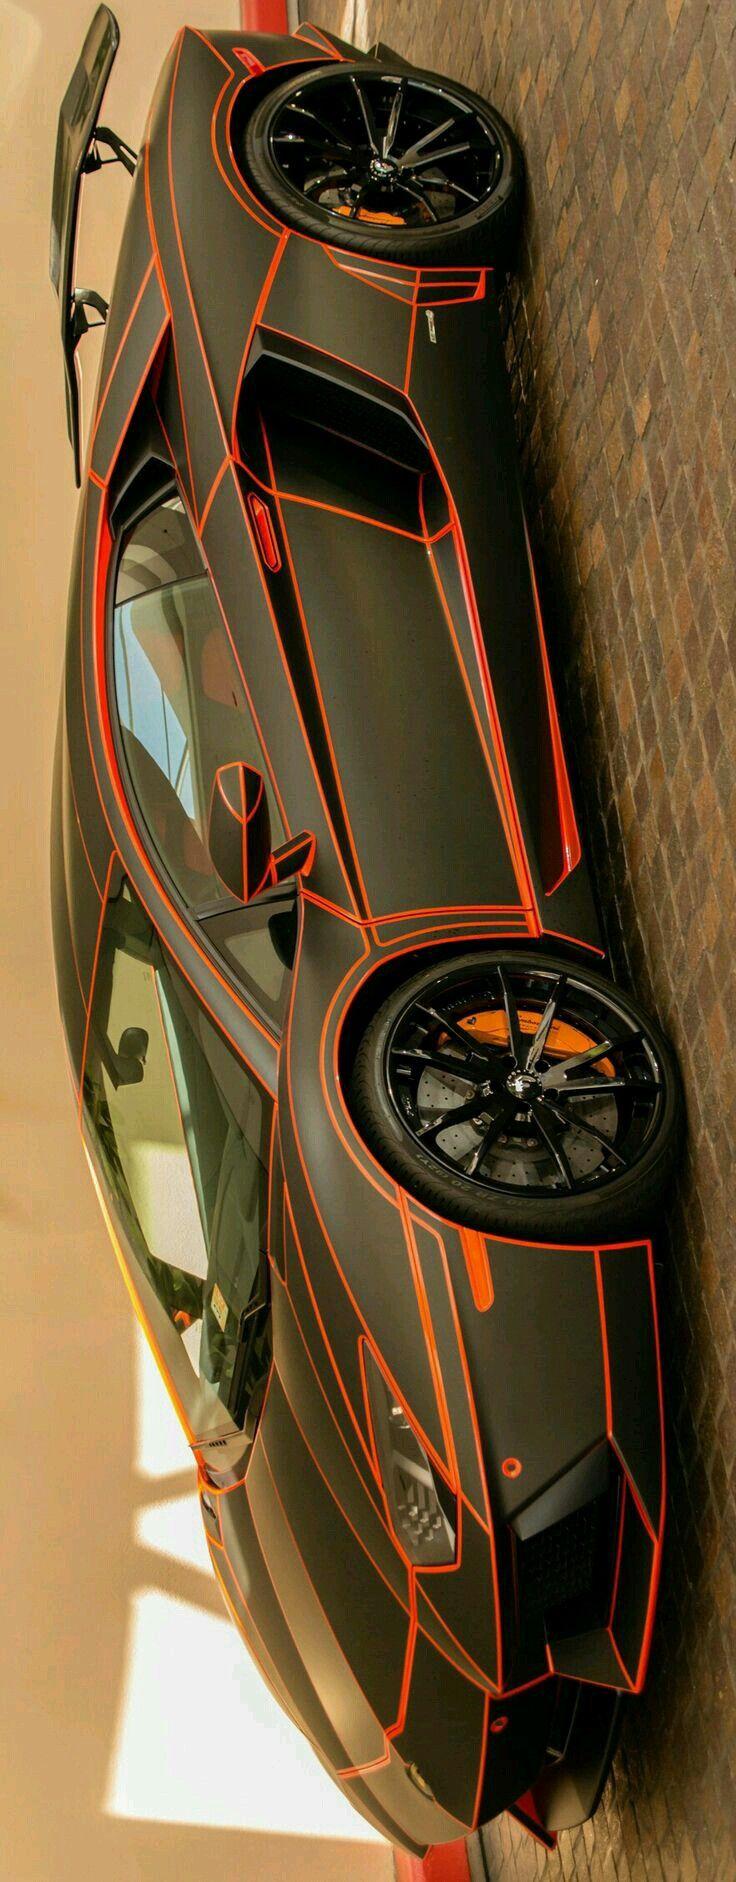 Cerramos el mes con Luxury Connoisseur || kallistos Stelios Karalis ||   •.♡ Follow me & Lamborghini Aventador by Stelios